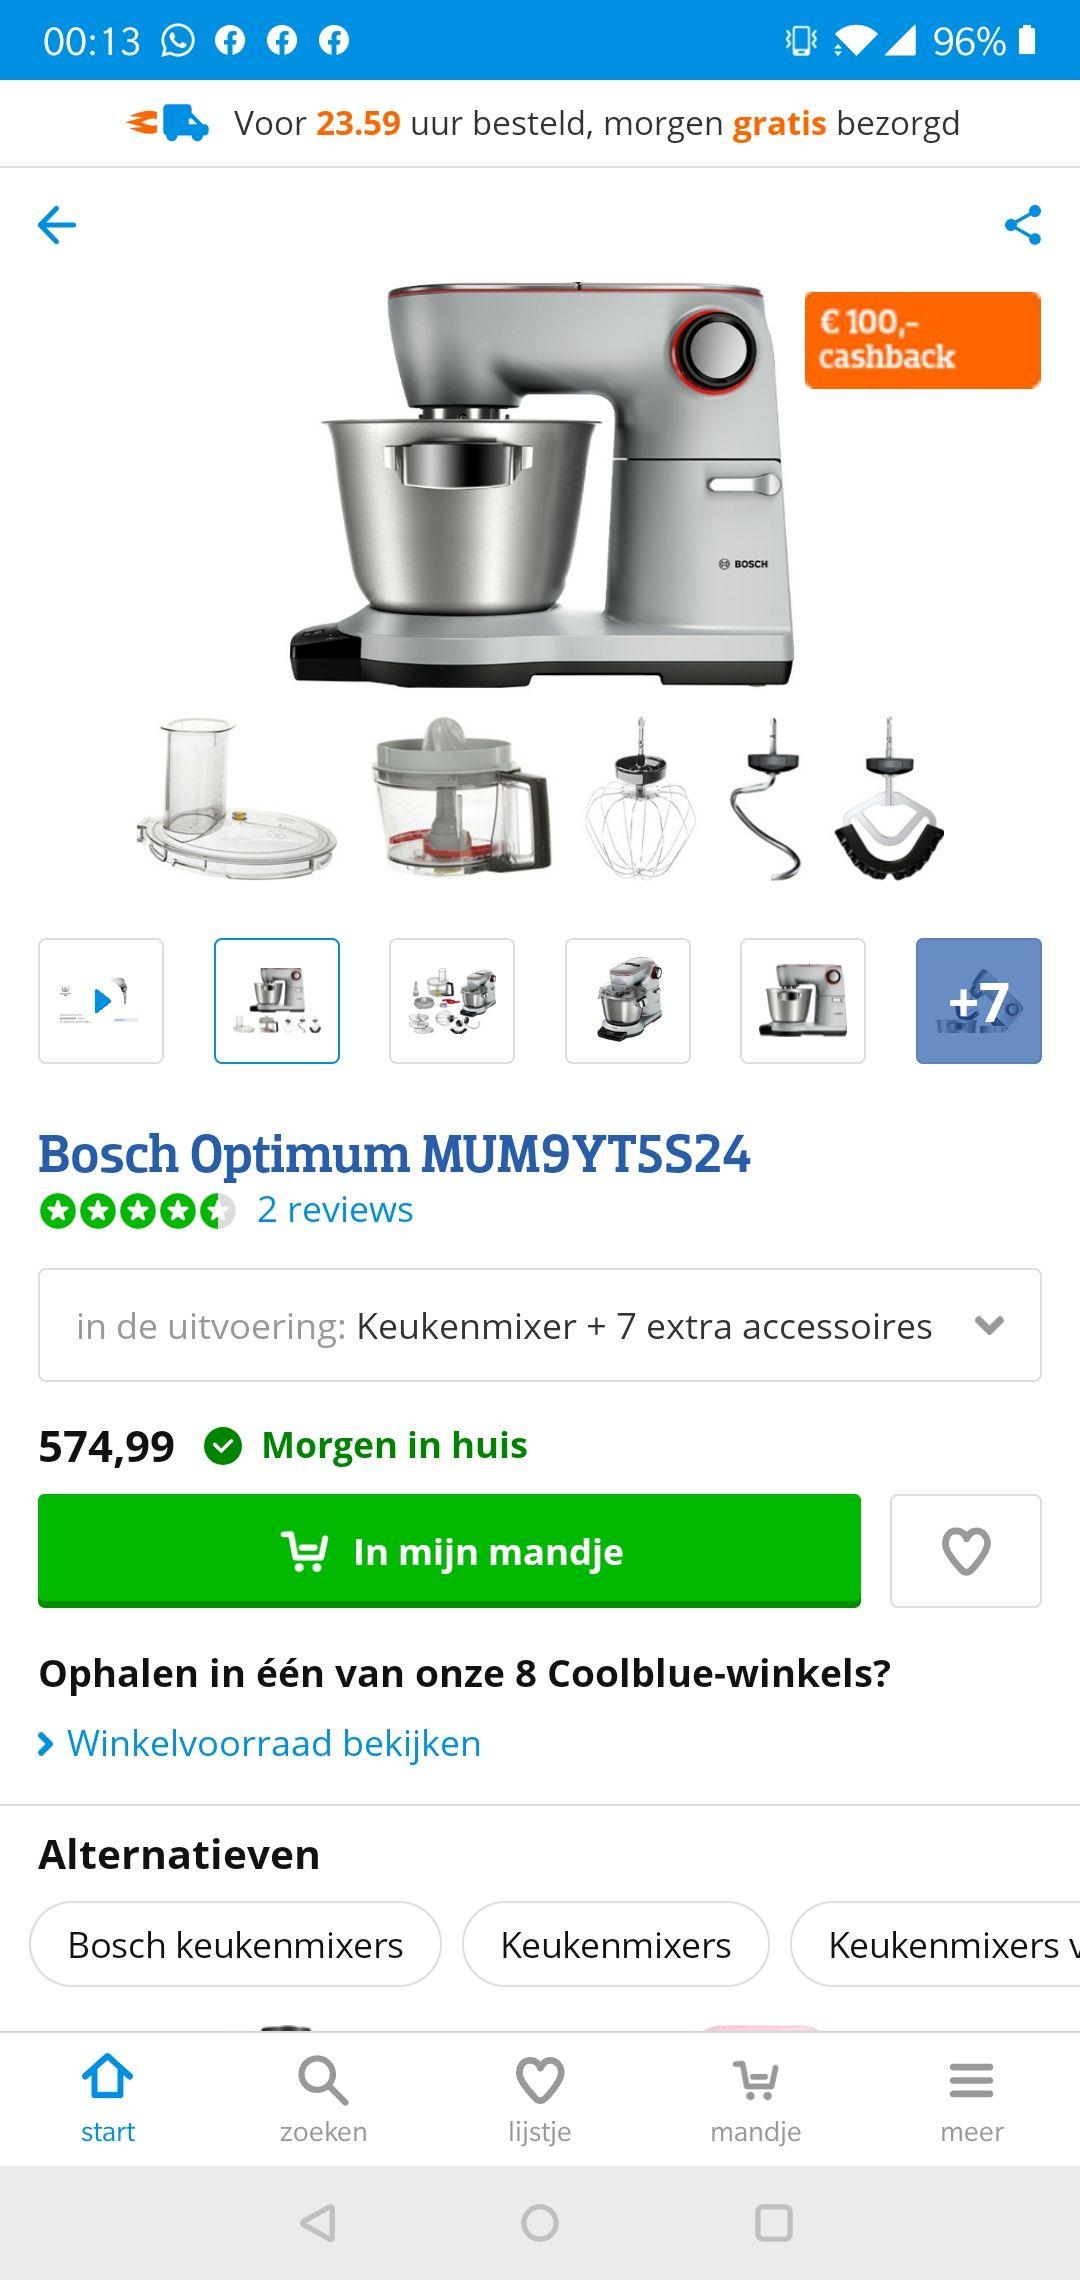 Bosch Optimum MUM9YT5S24 met €100 cashback